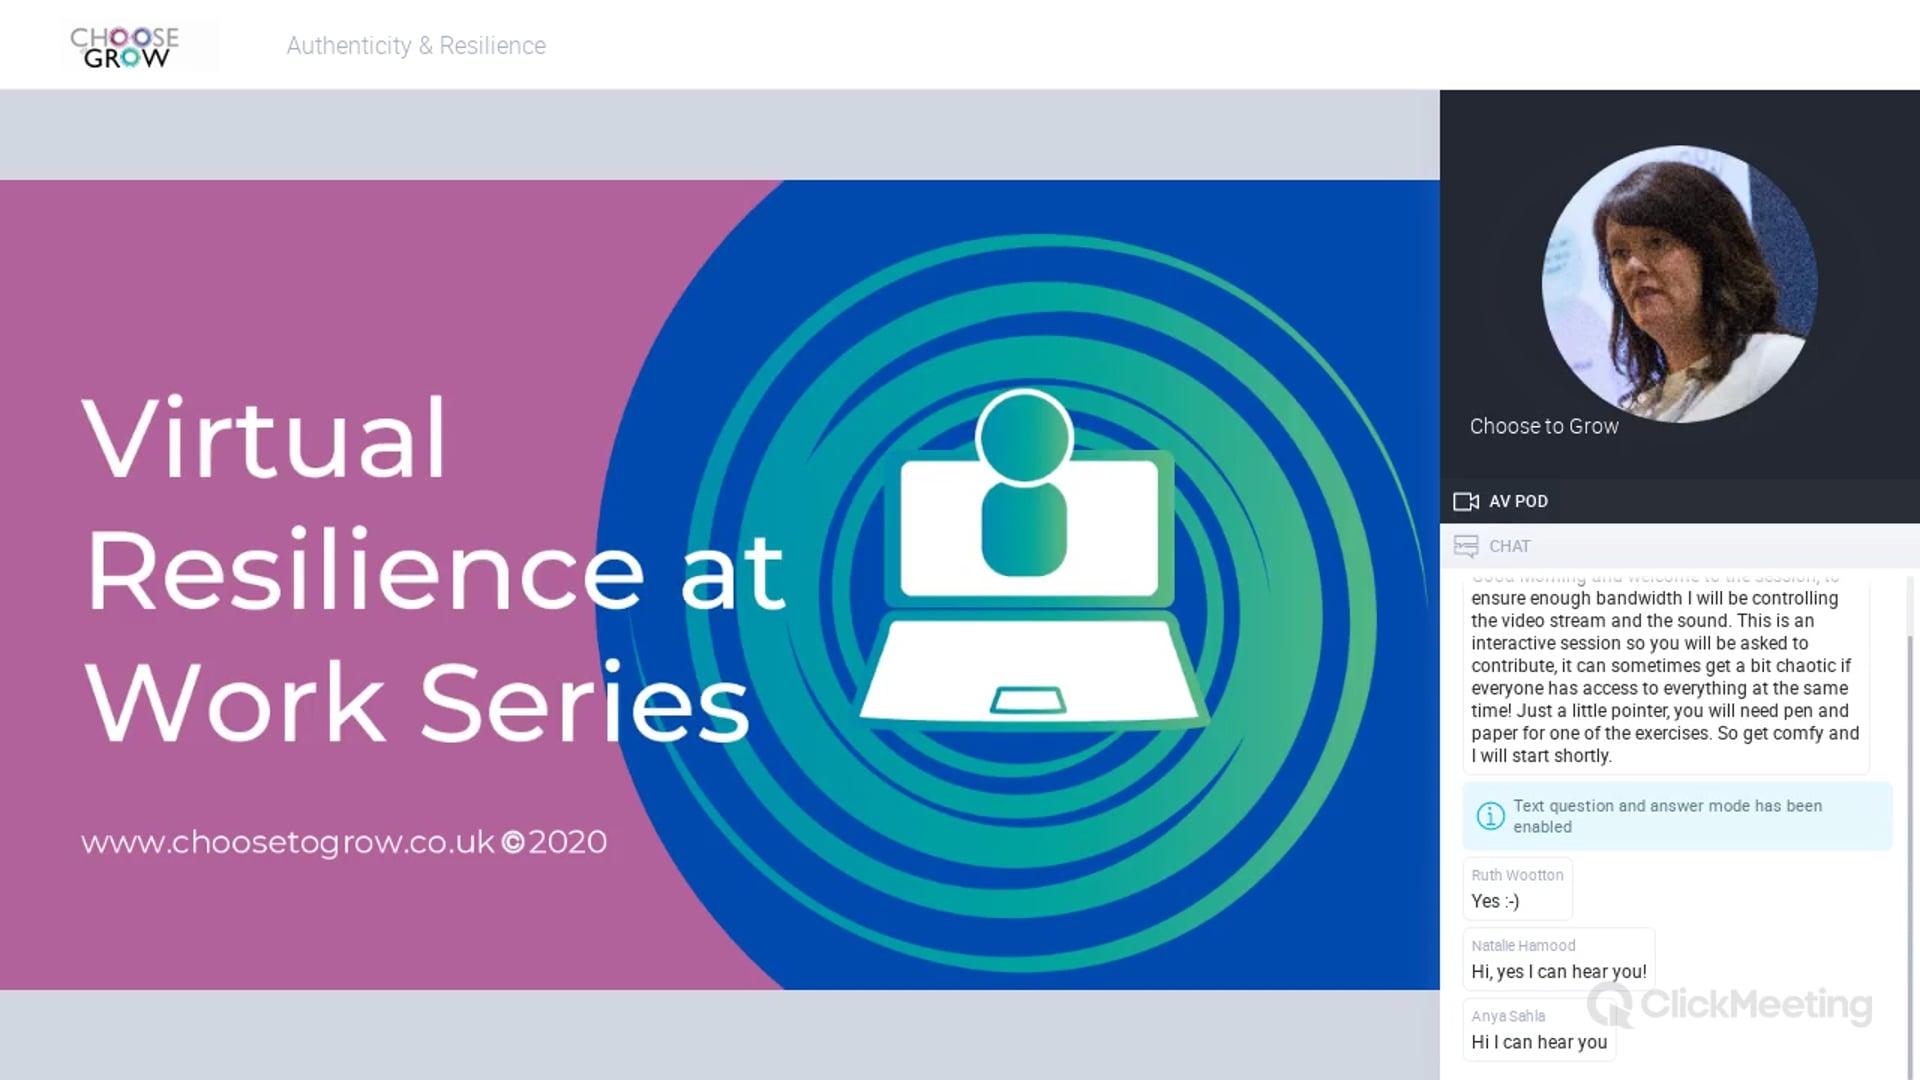 Authenticity & Resilience Webinar April 2020